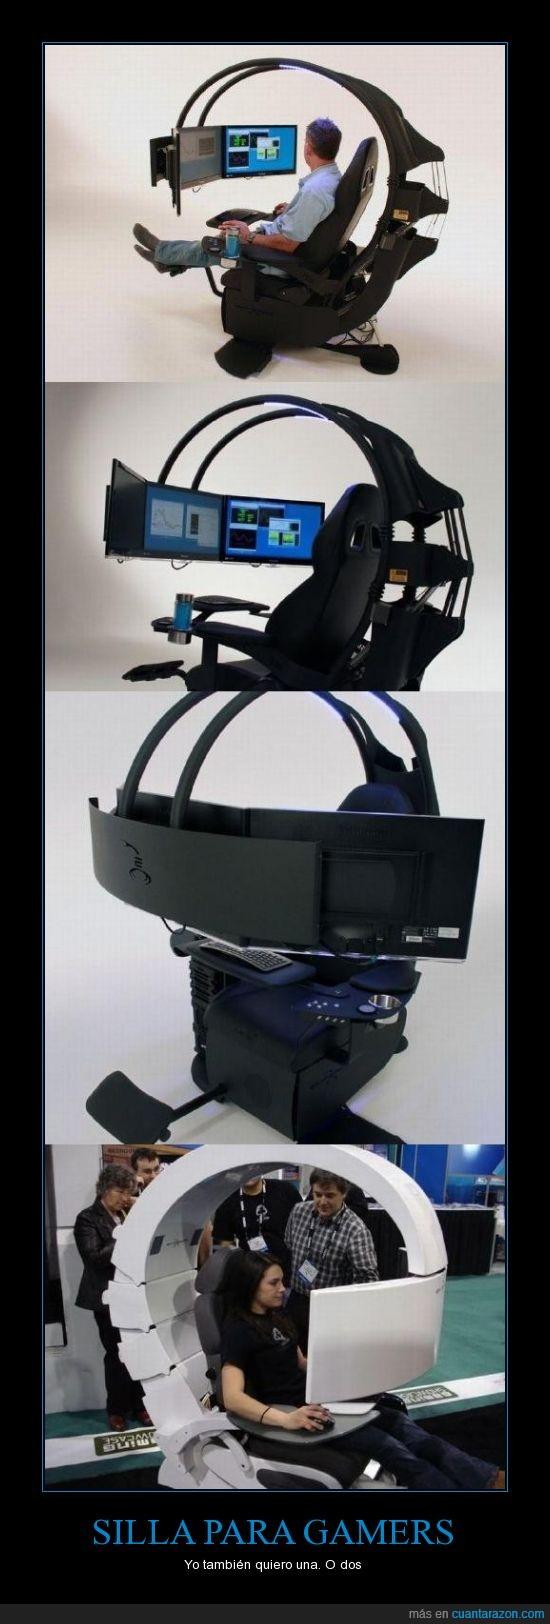 caro,chulo,gamers,mola,ordenador,pantalla,pc,silla,tele,videjojuego